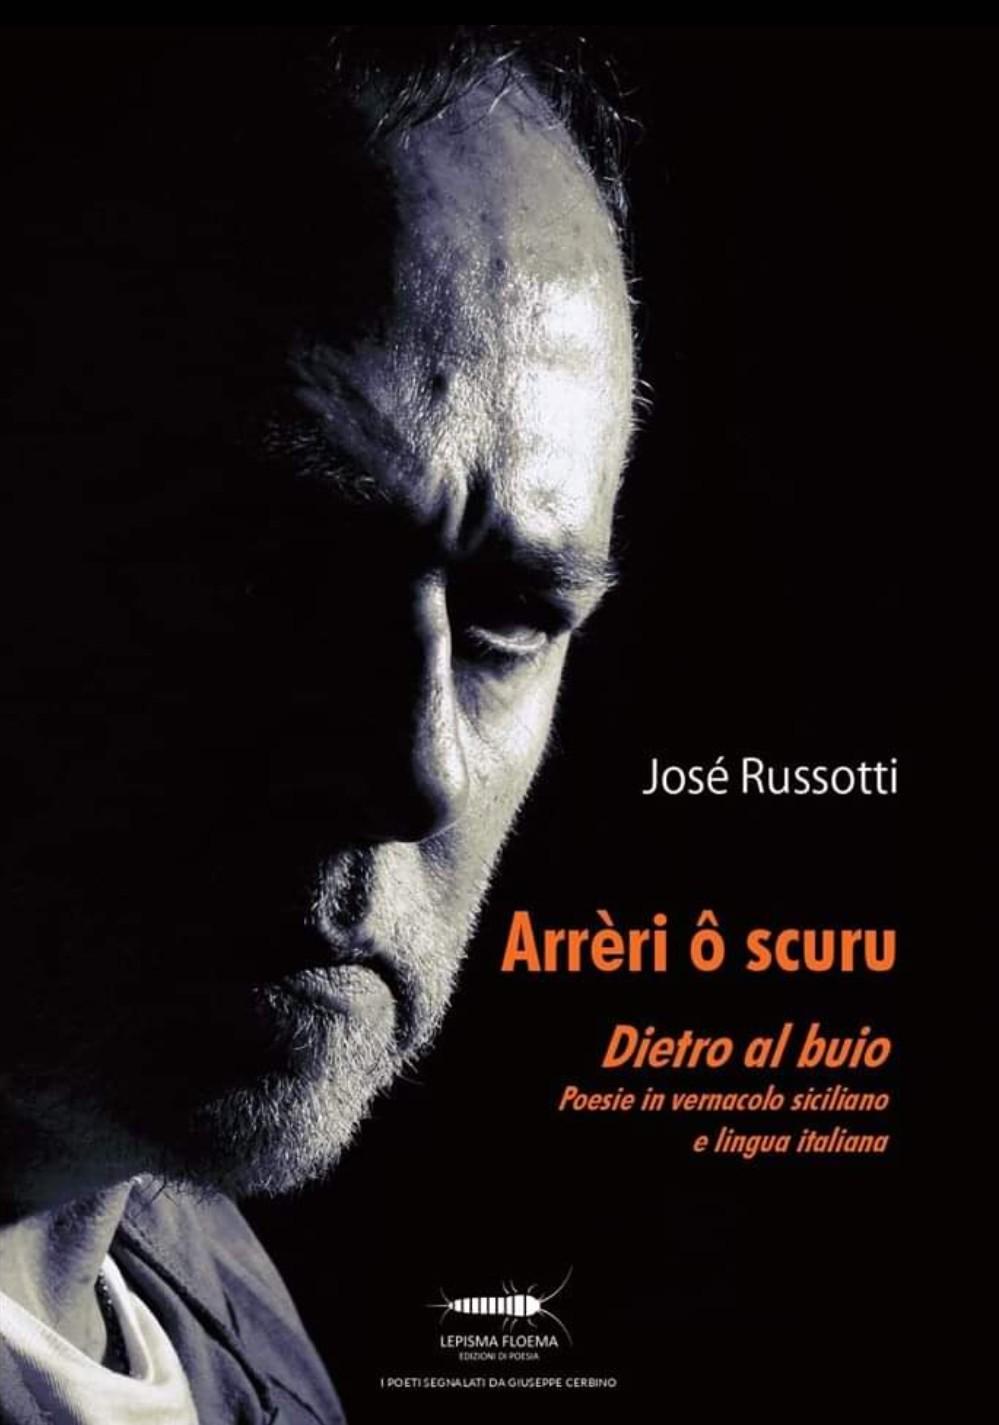 jose_russotti